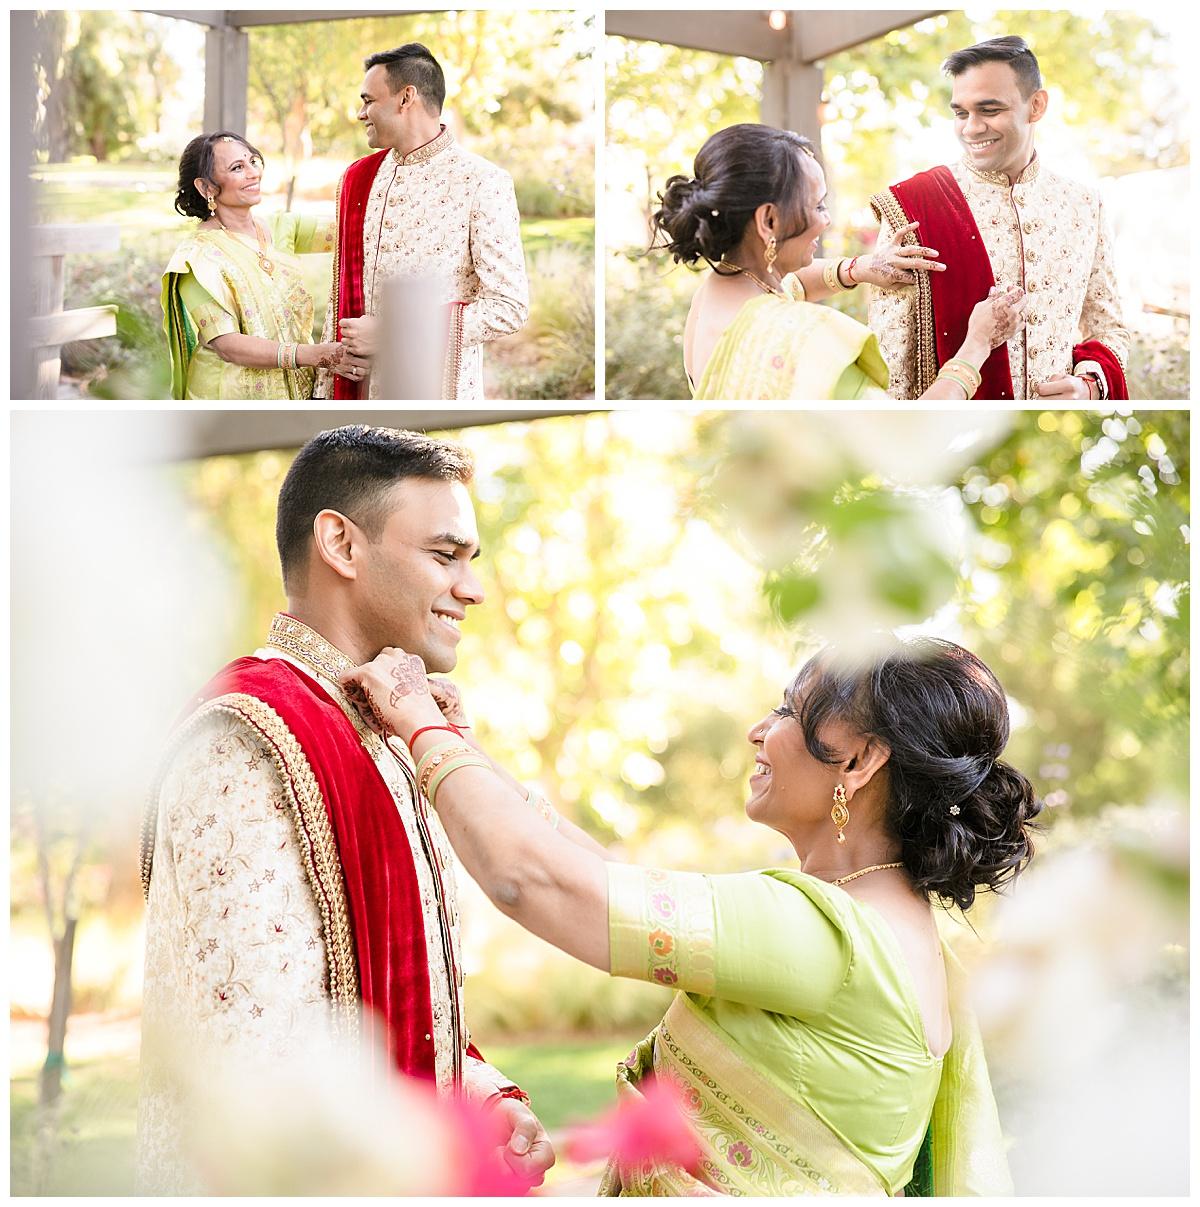 0103 LR Wedgewood Gallaway Downs Temecula Indian Wedding Photography